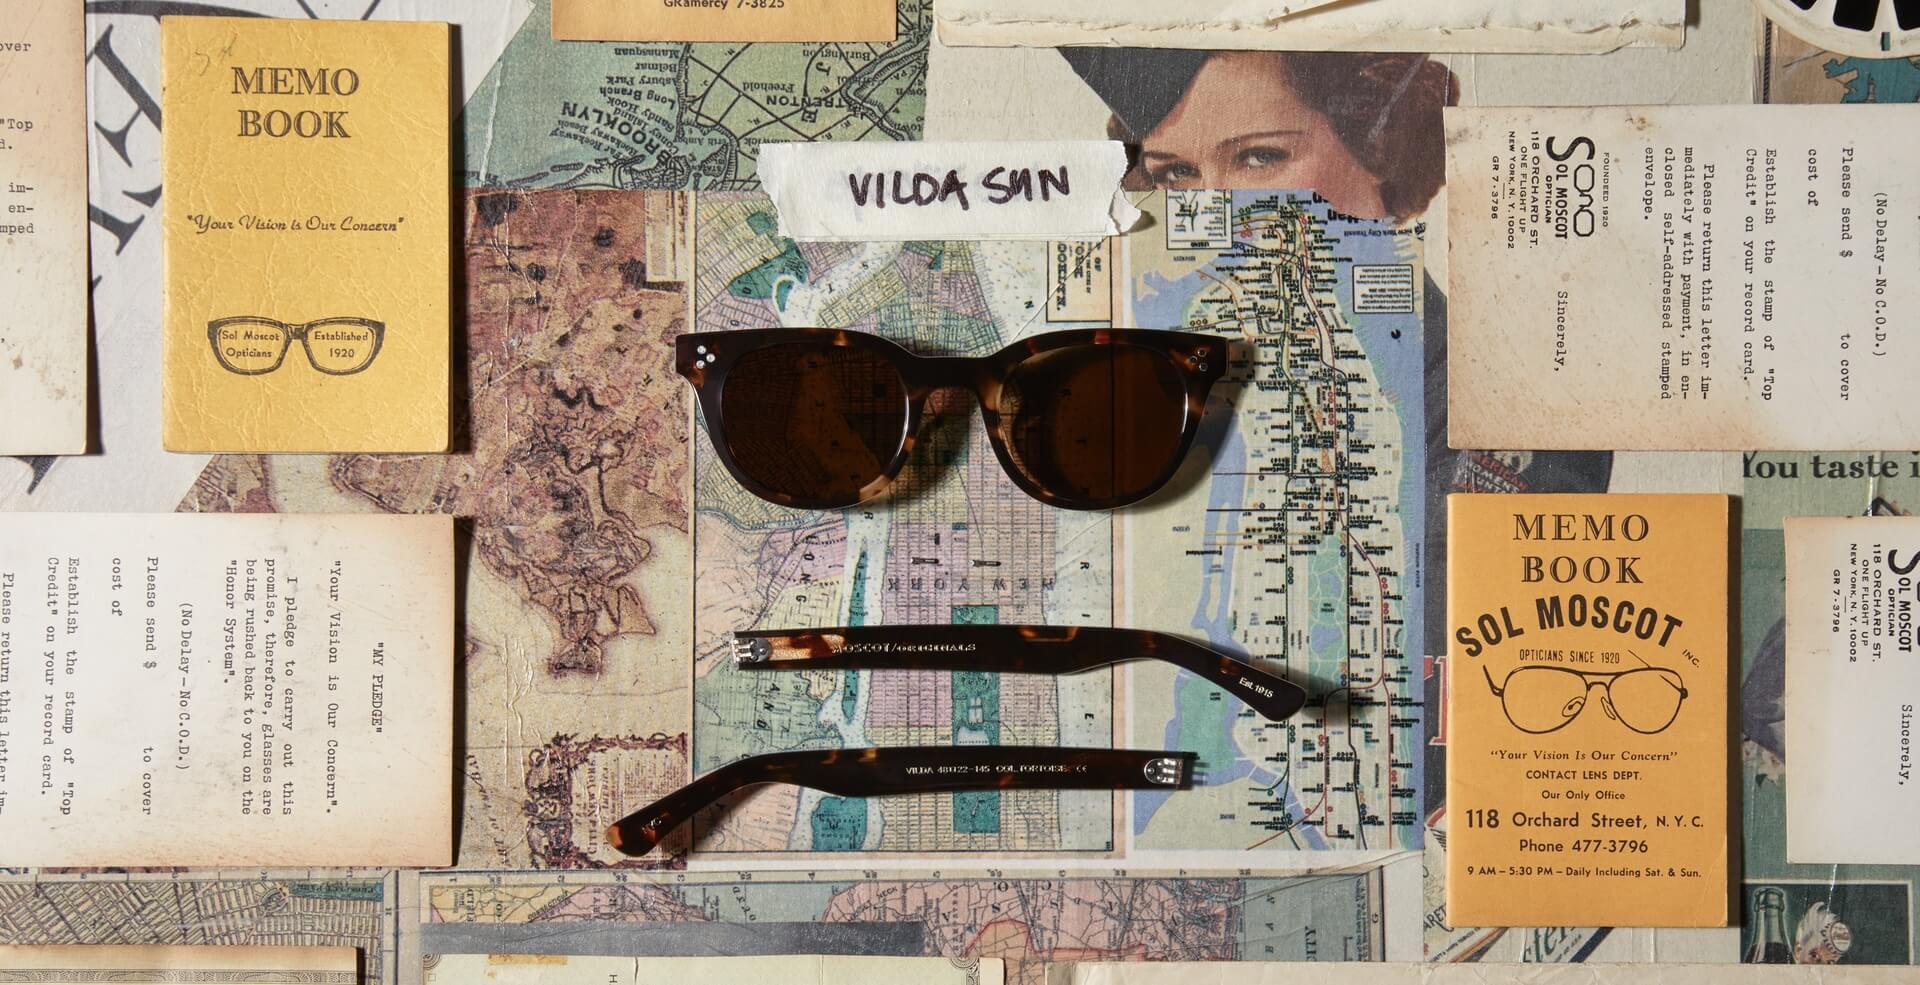 VILDA SUN